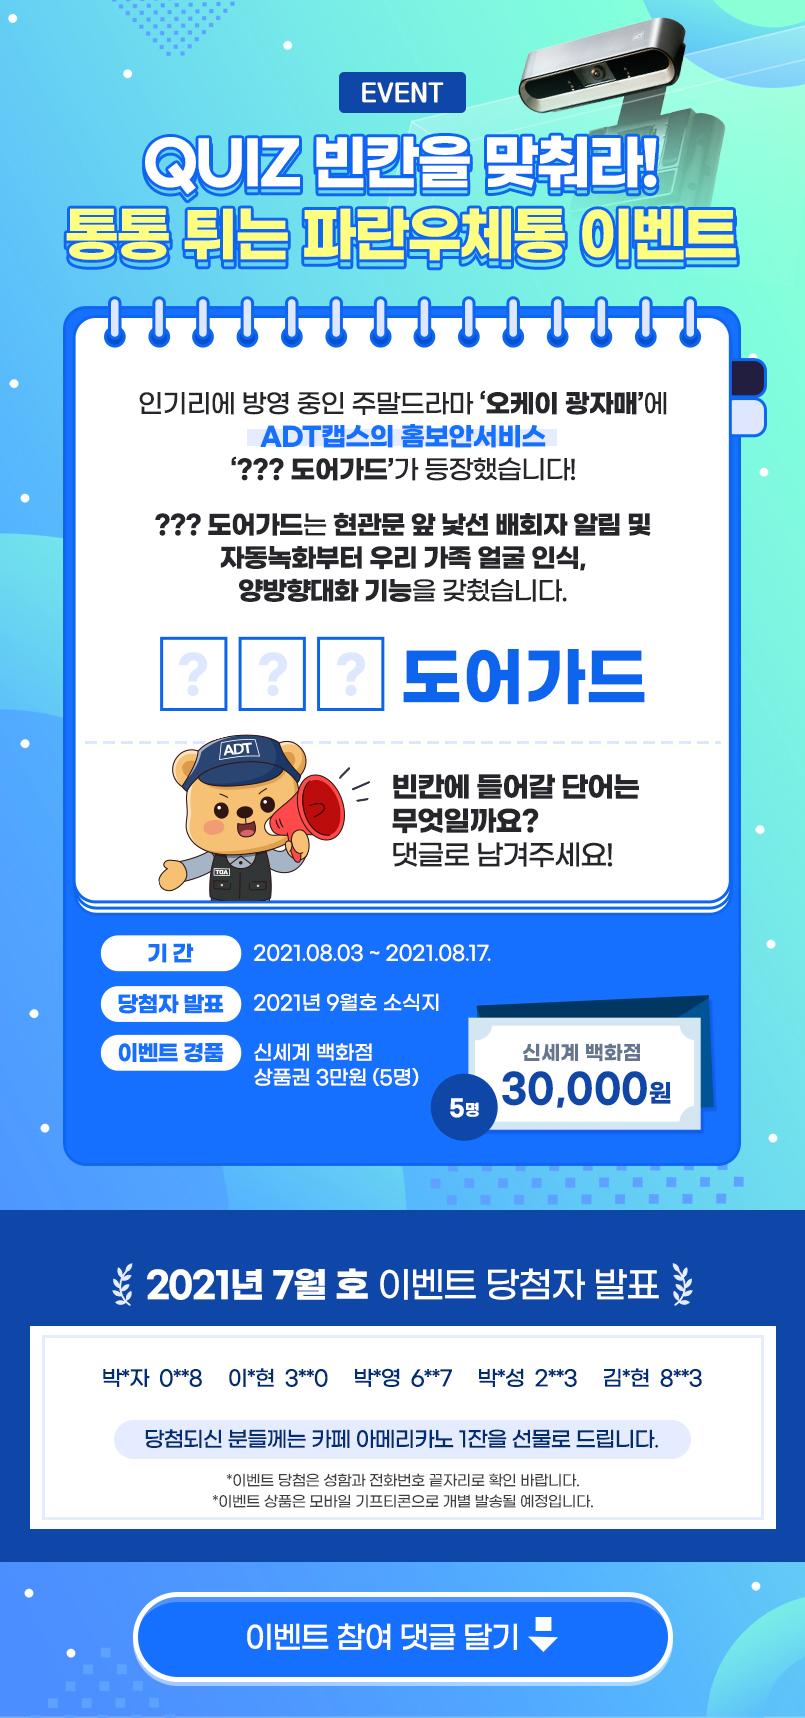 ADT캡스 소식지 파란우체통 2021/08월호 이벤트